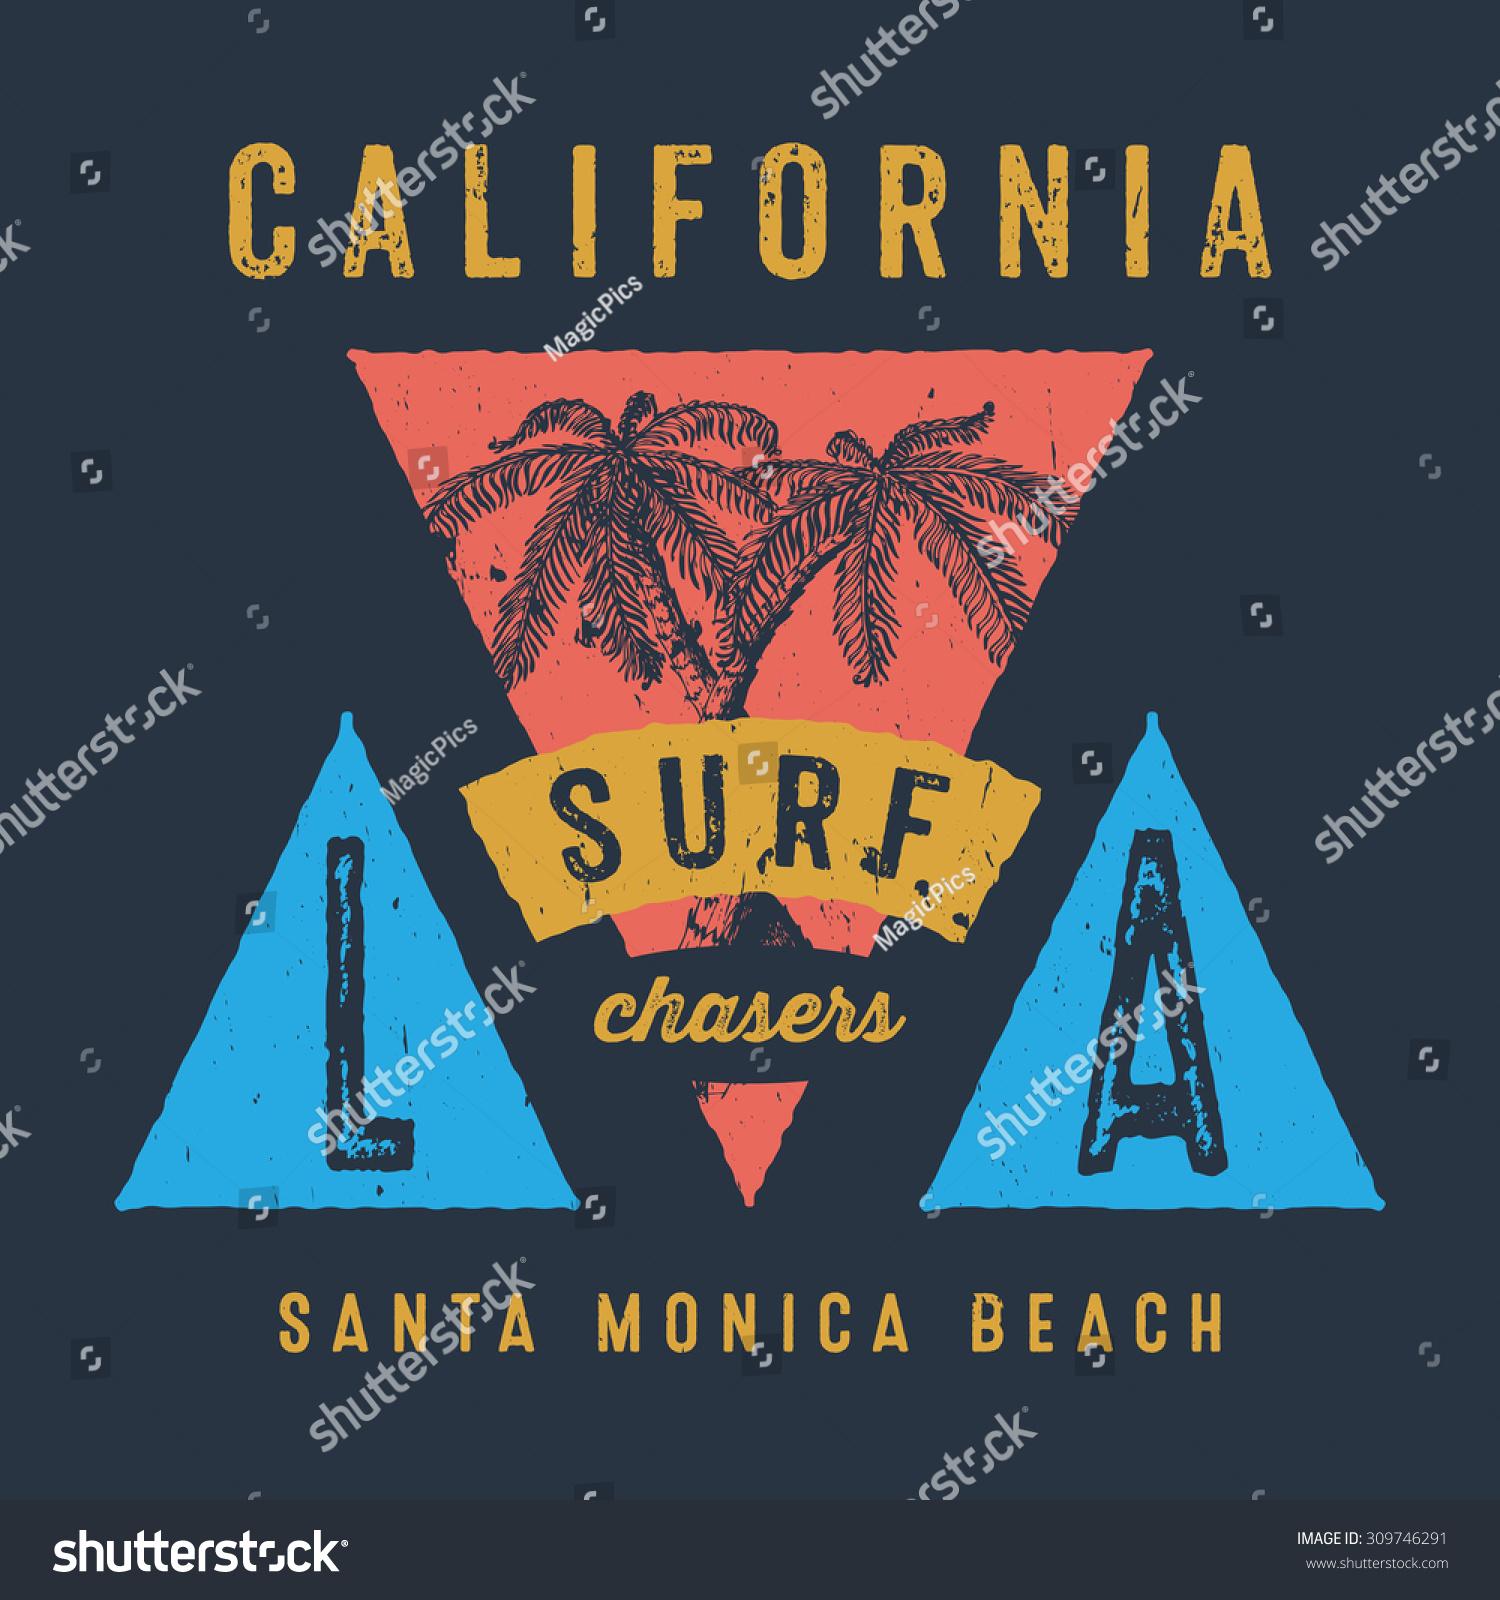 37 CALIFORNIA SURF CHASERS SANTA MONICA BEACH Handmade Palms trees retro style Design fashion apparel textured print T shirt graphic vintage vector illustration badge label logo template